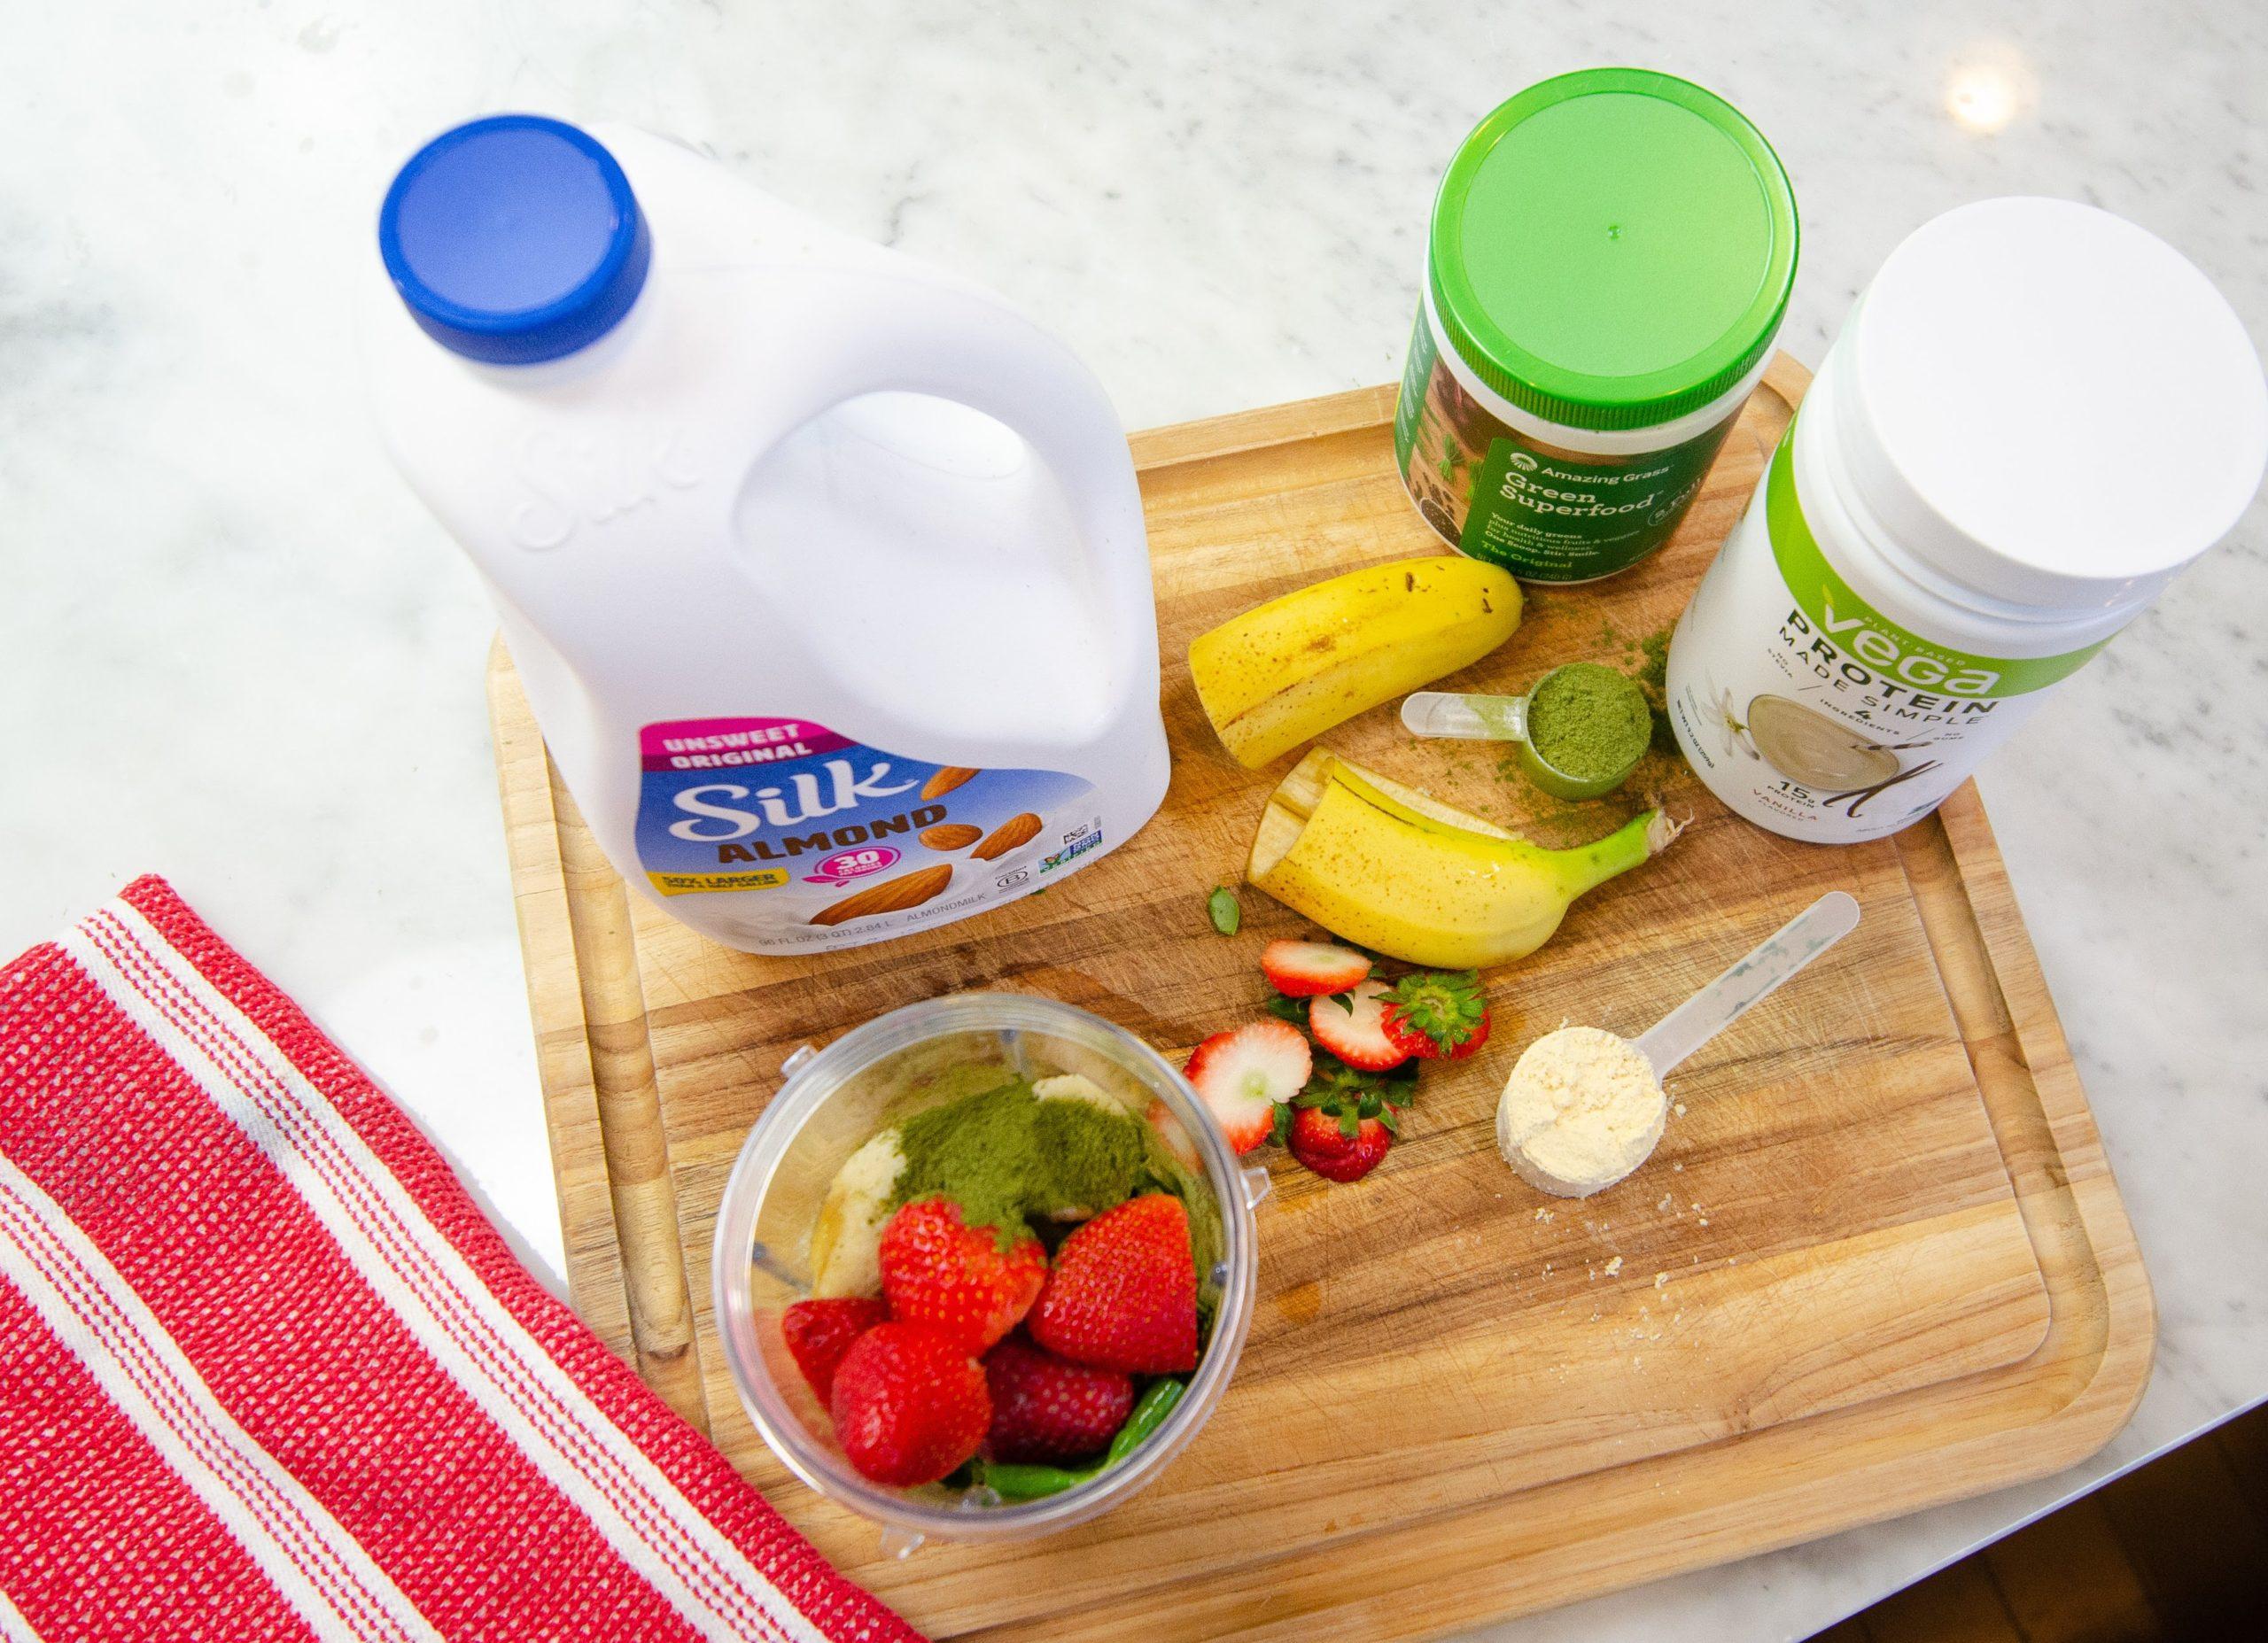 Silk Almond Milk, Vega Protein Powder